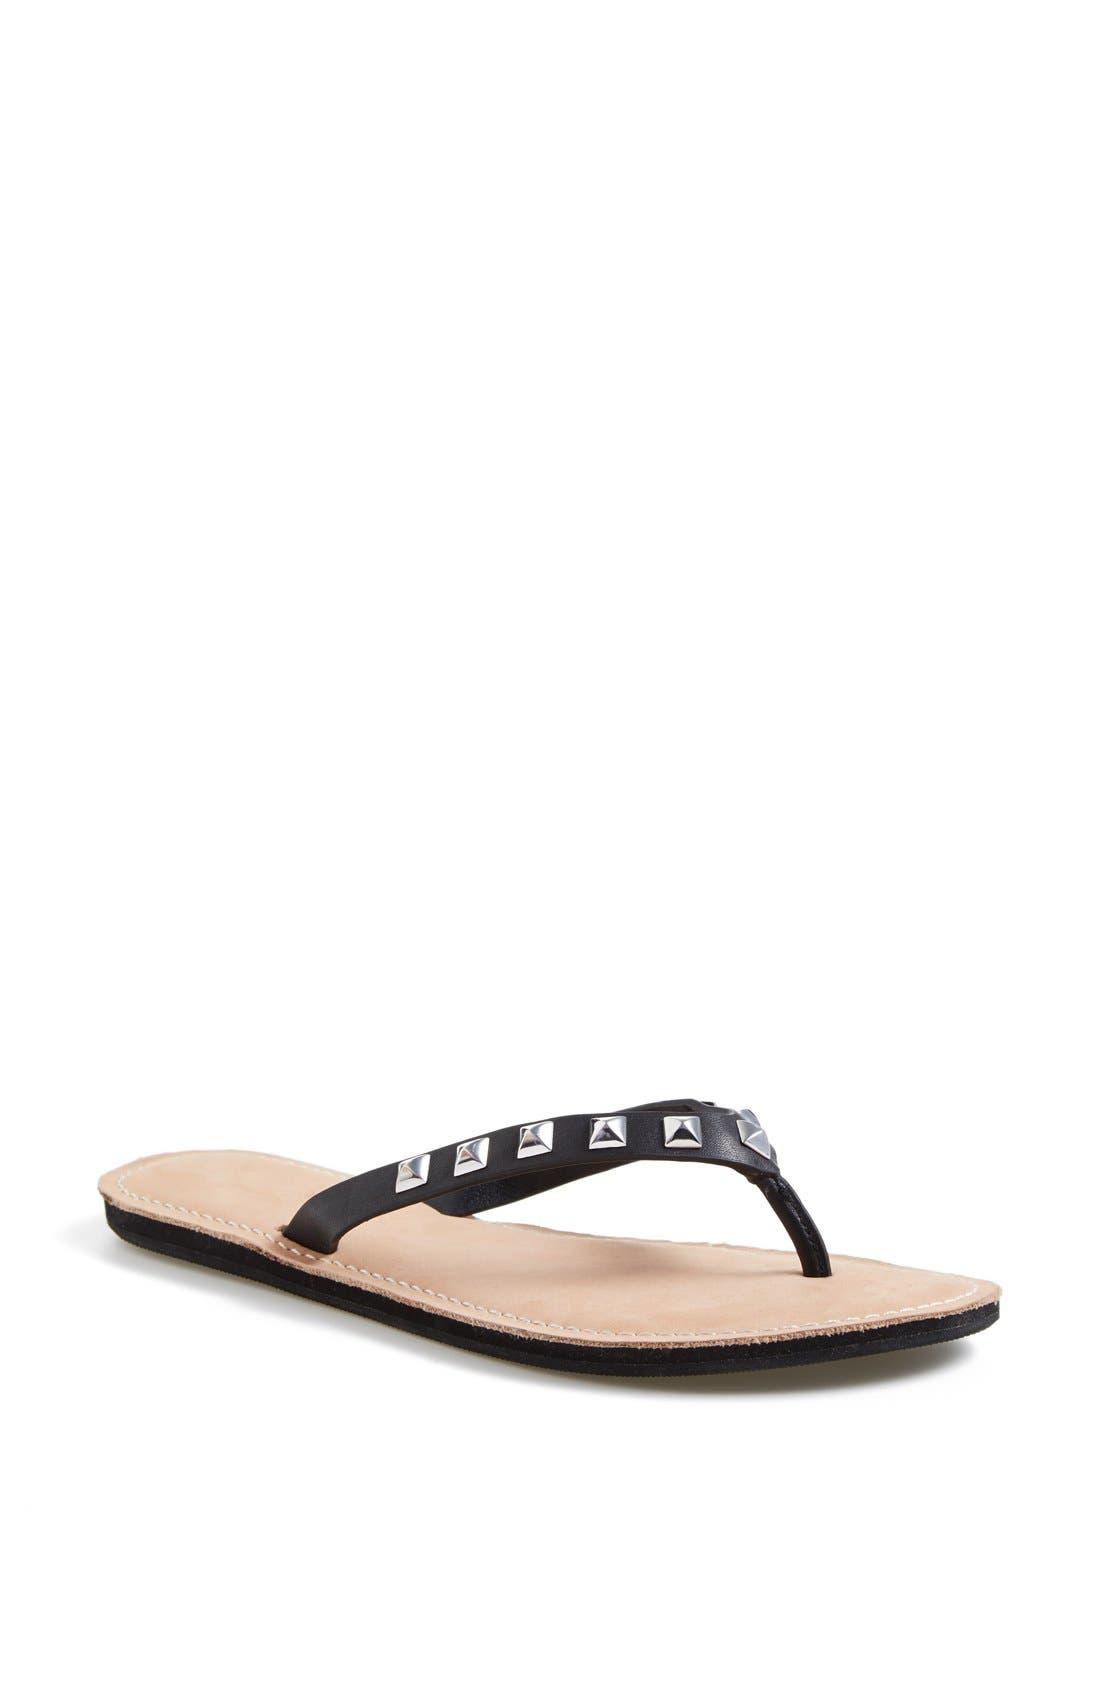 REBECCA MINKOFF 'Fiona' Thong Sandal, Main, color, 001